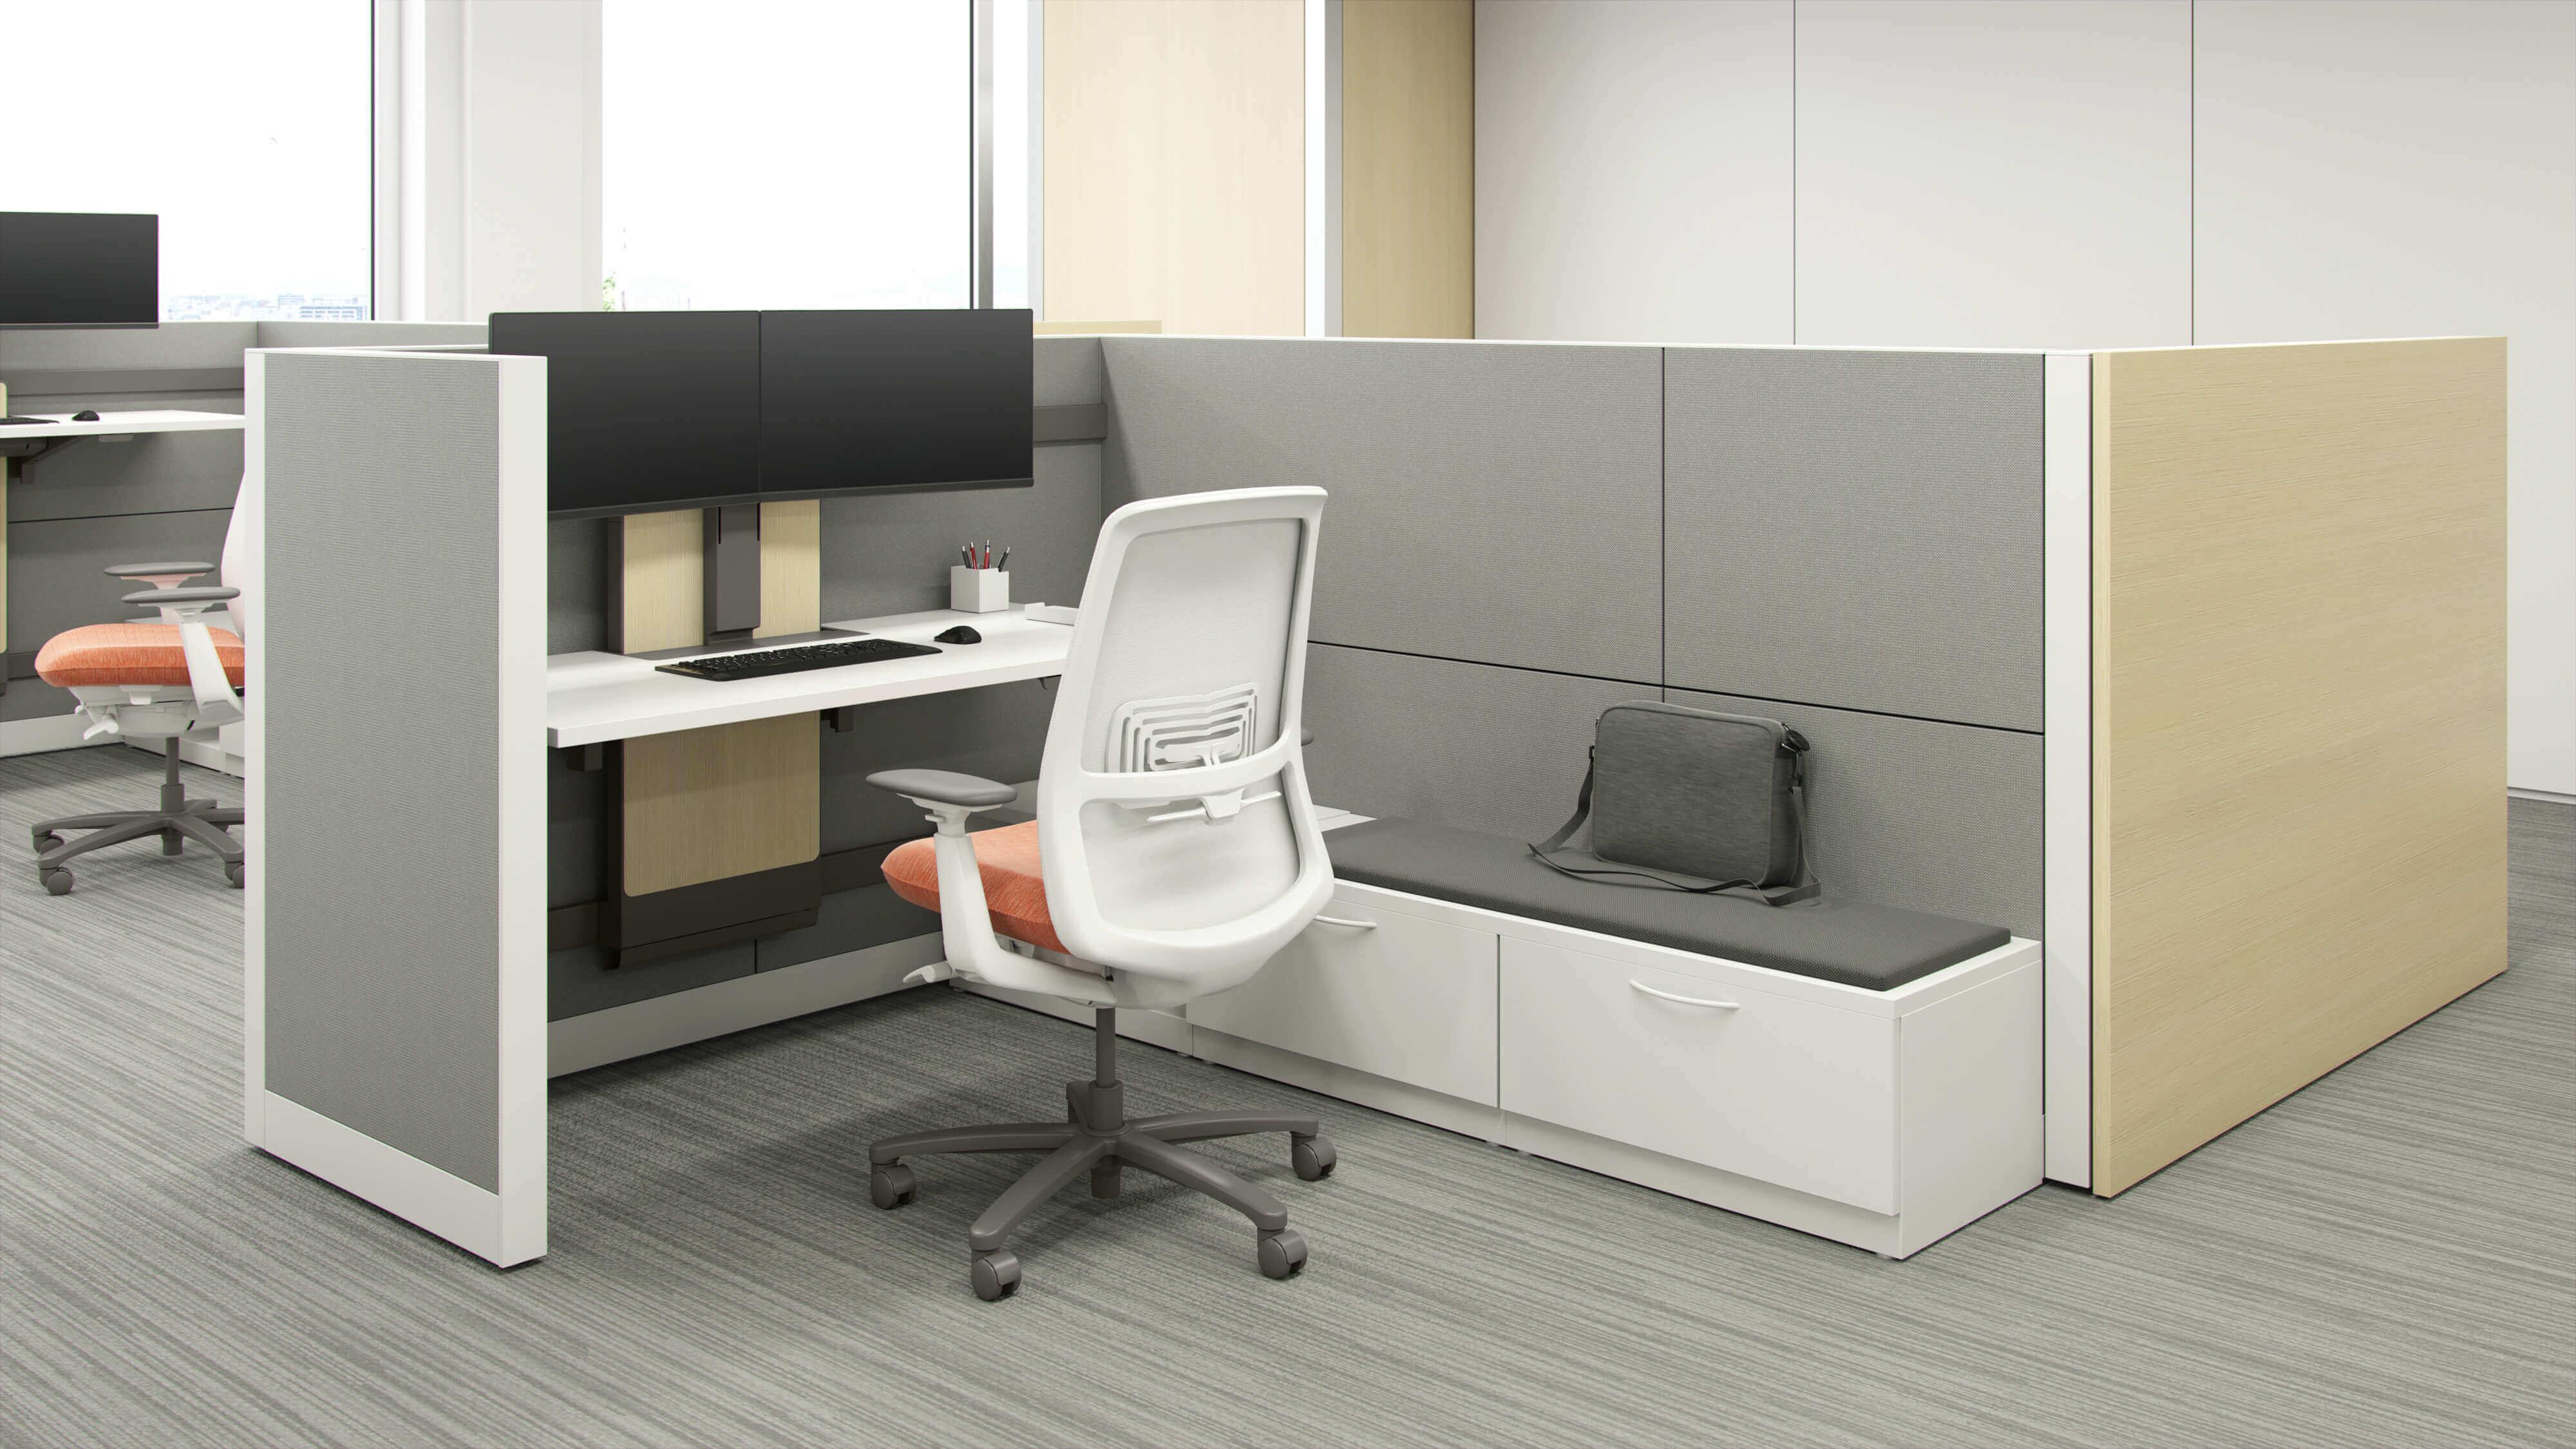 cubicle in open office